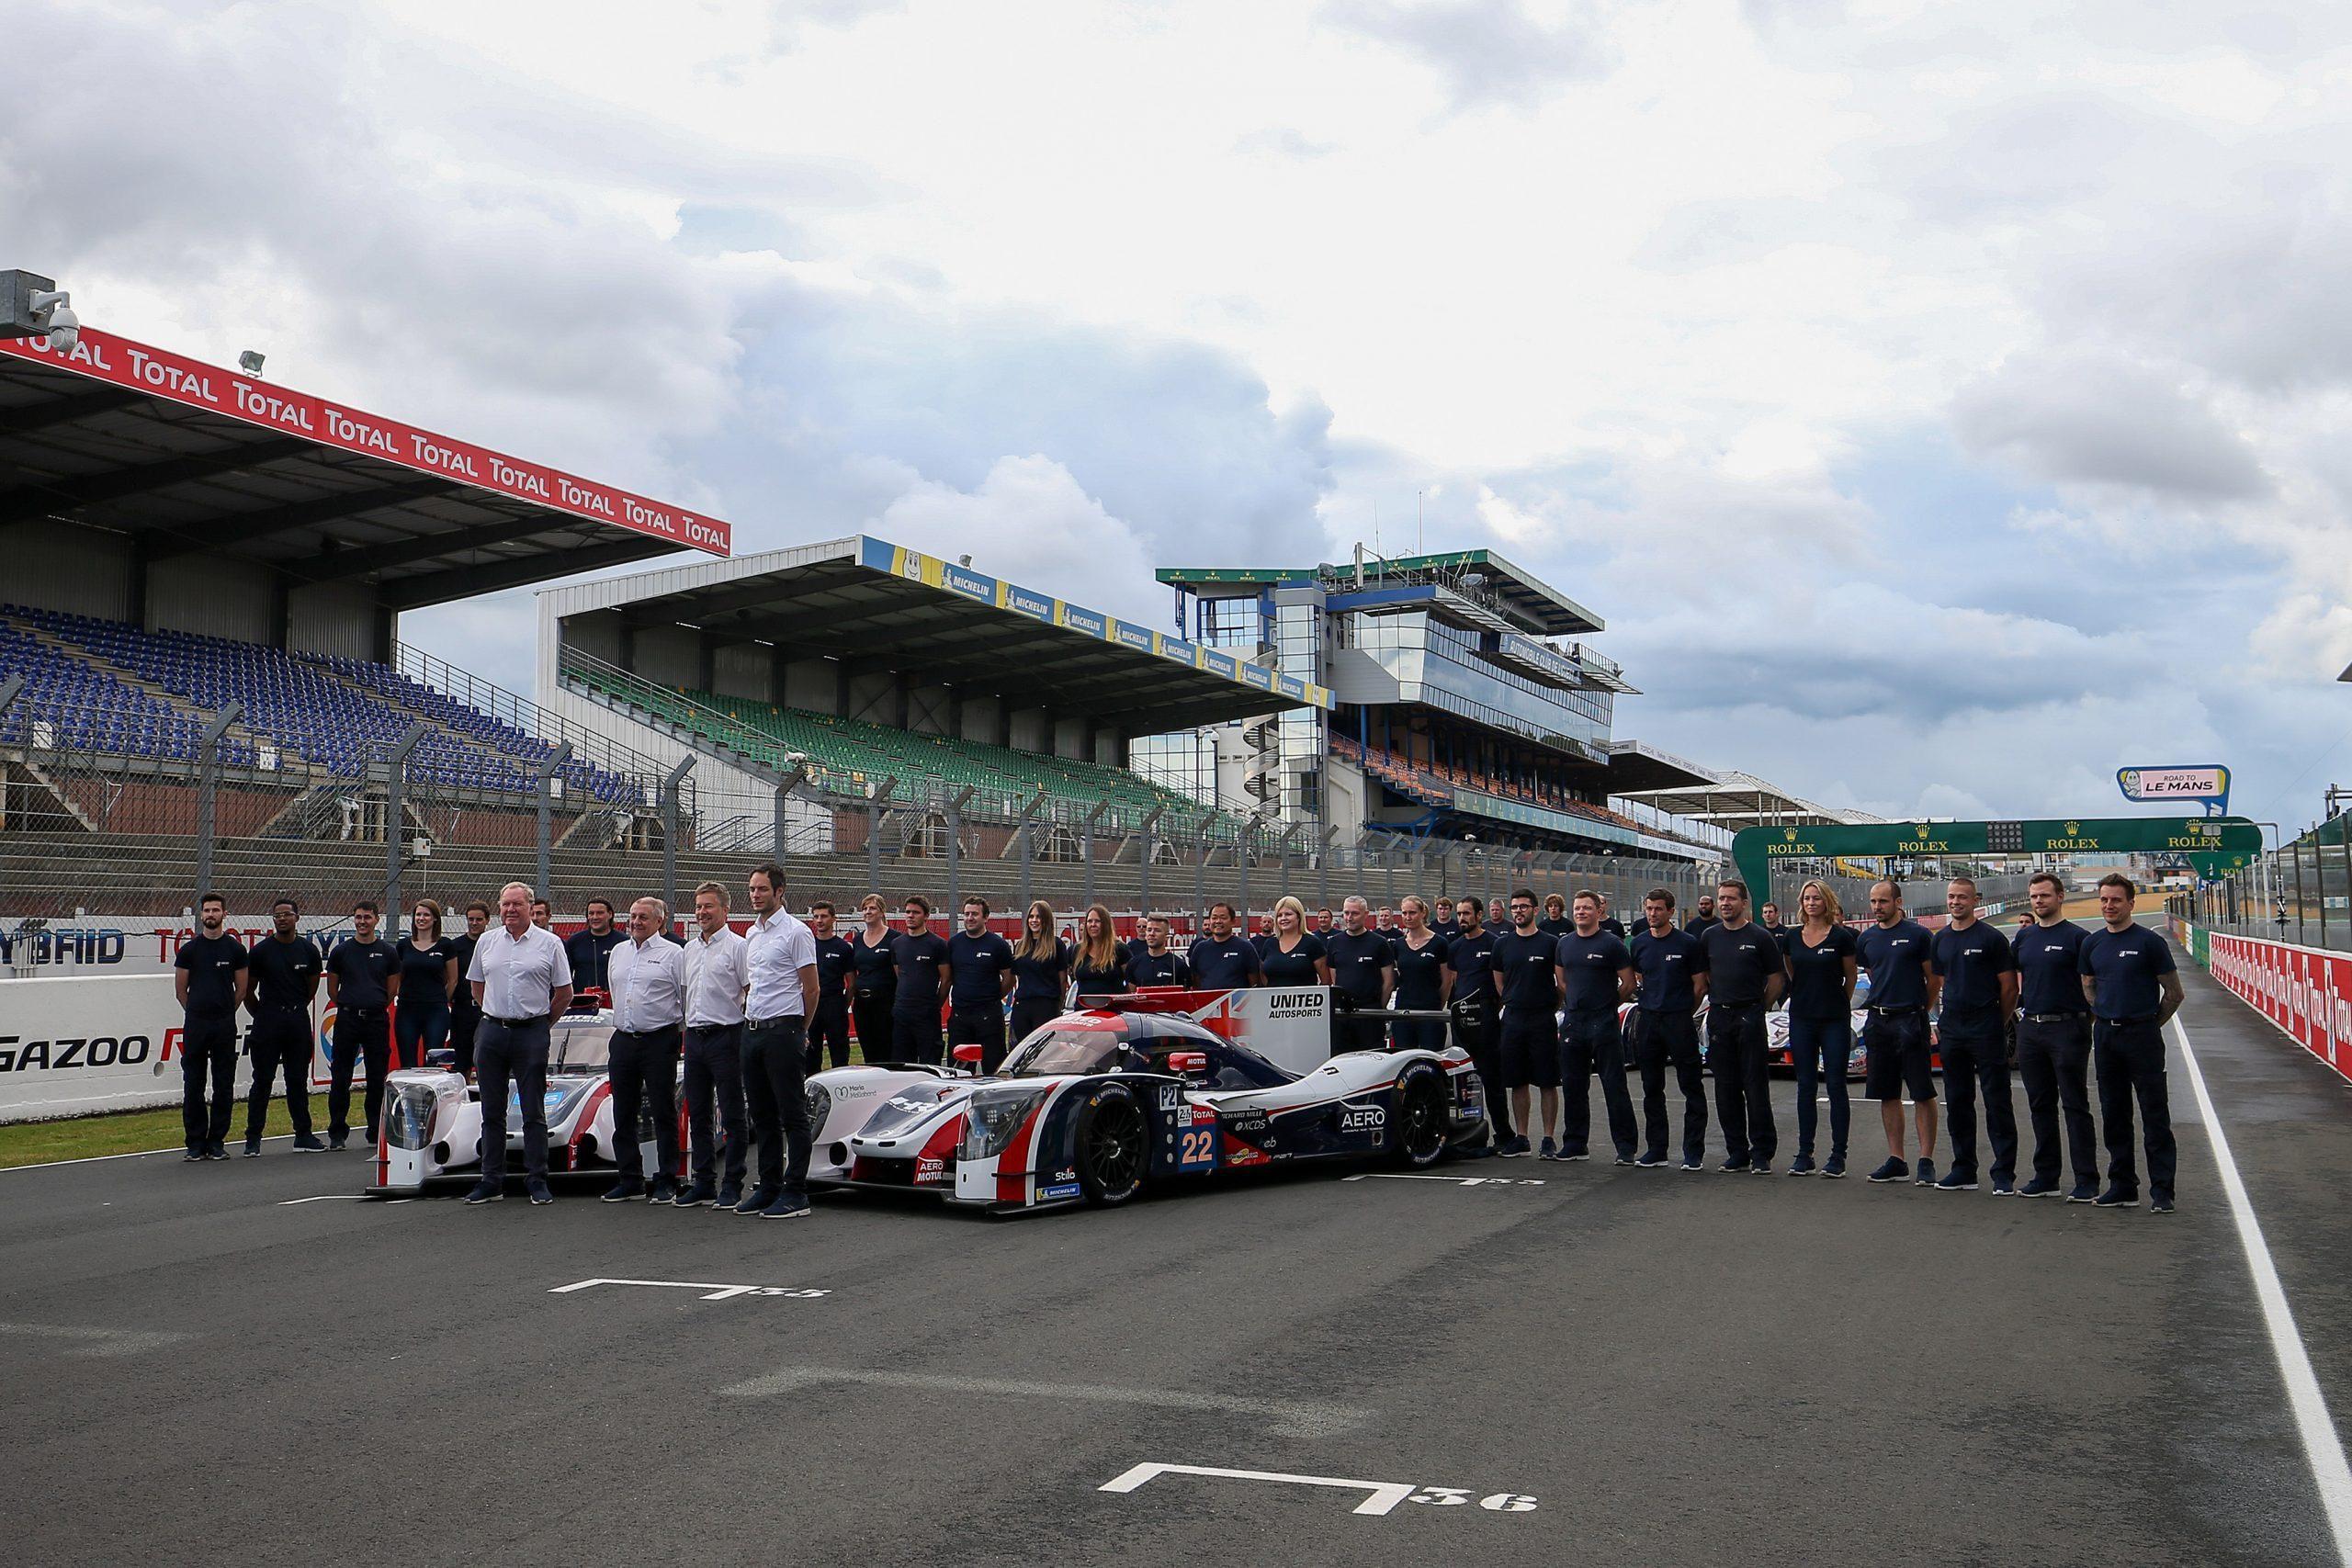 Le Mans DT scaled